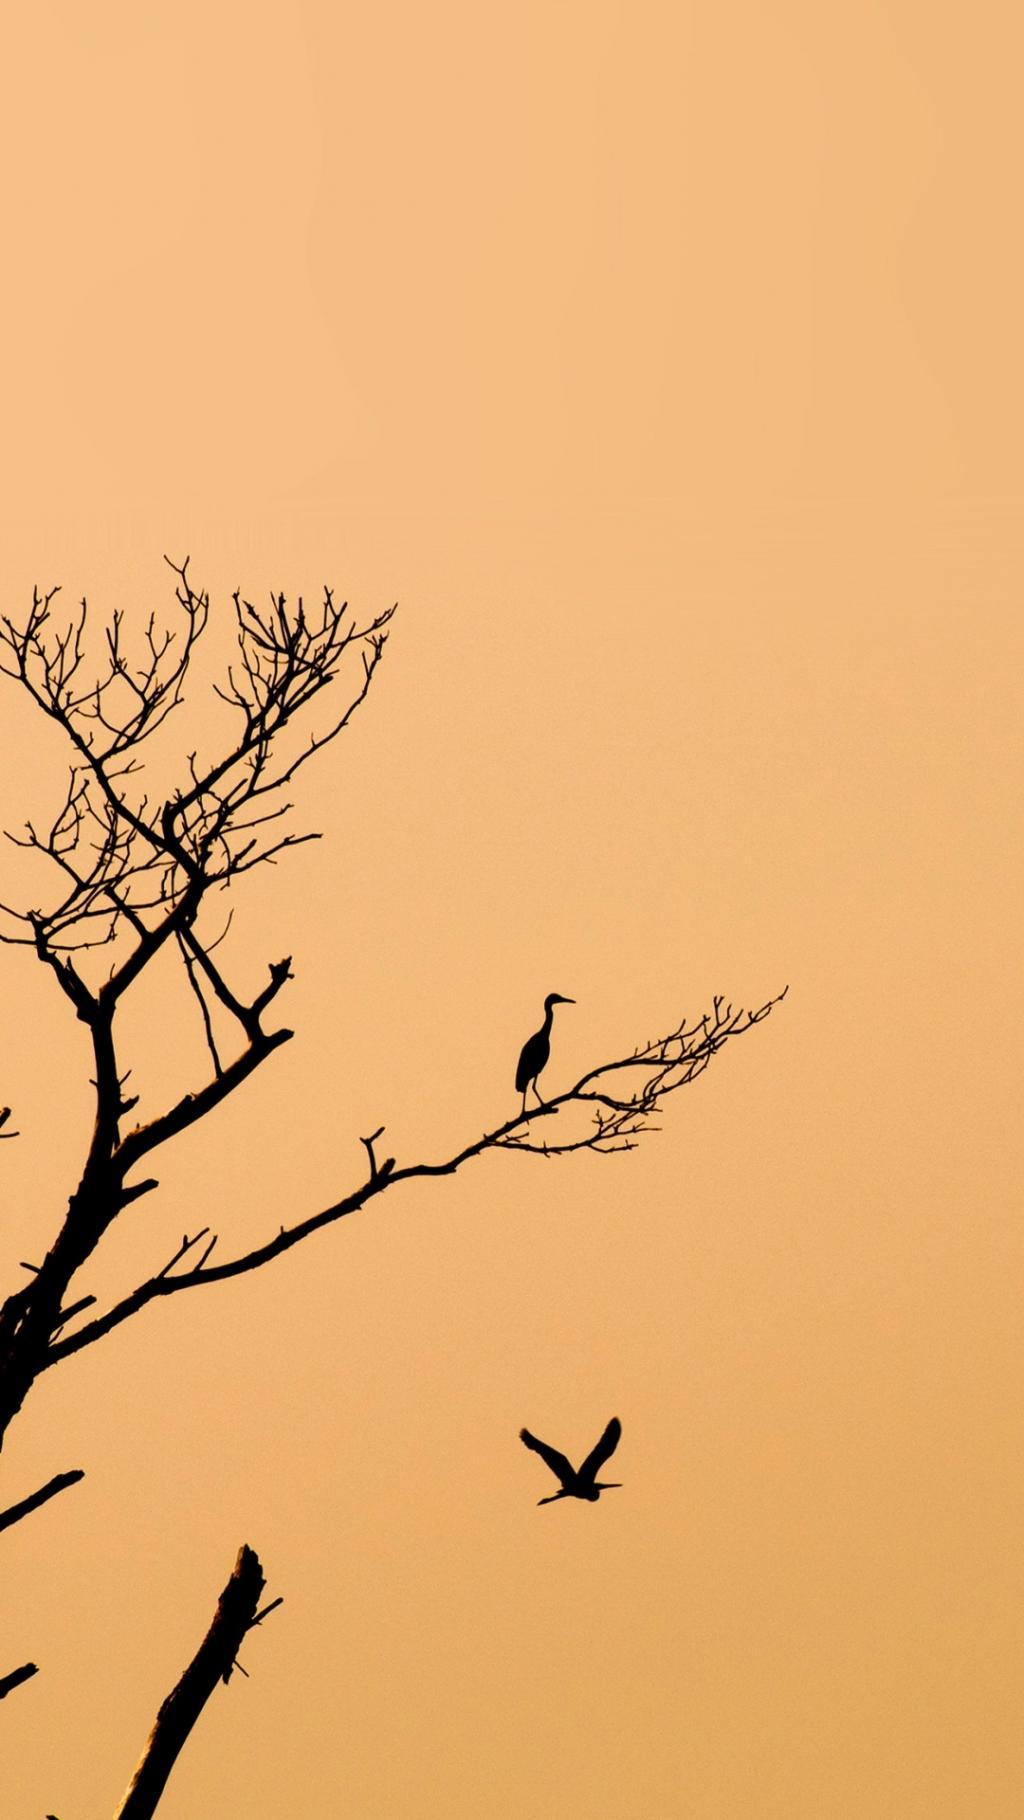 Galaxy Note 3 Hd Wallpaper 停栖在树上的鸟 锁屏图片 高清手机壁纸 动物 回车桌面